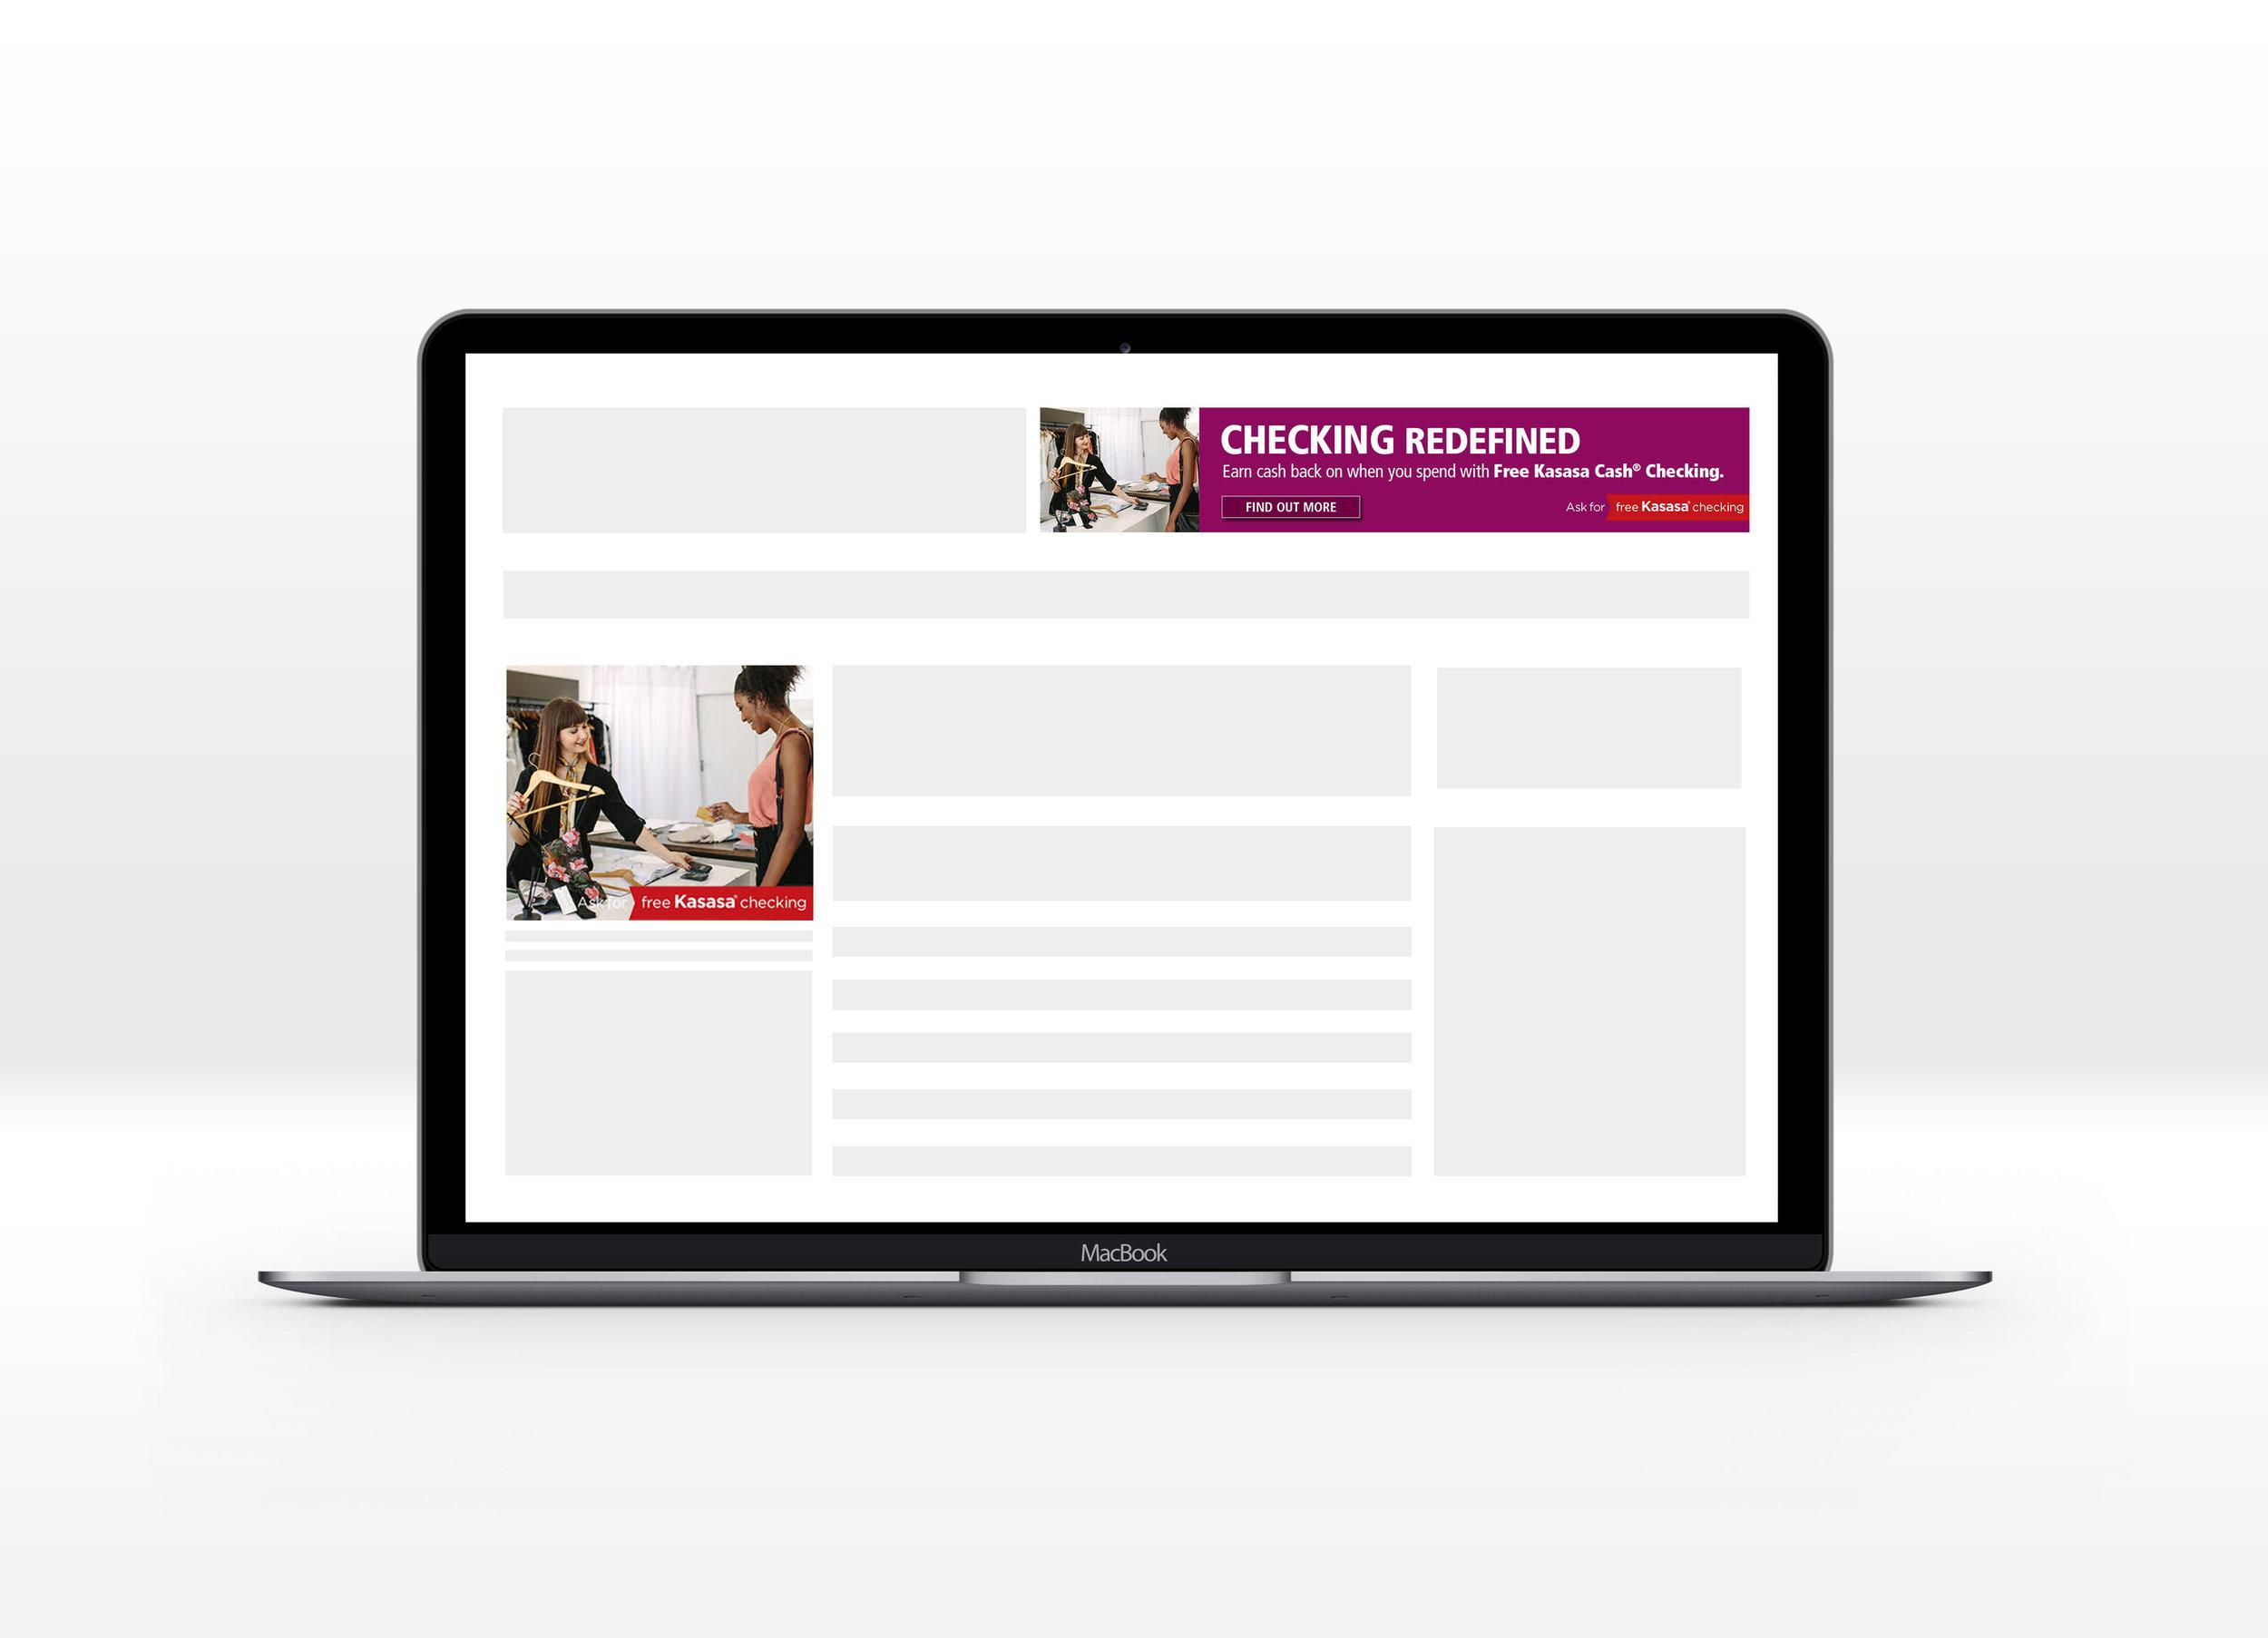 Kasasa Cash Checking Web Banners